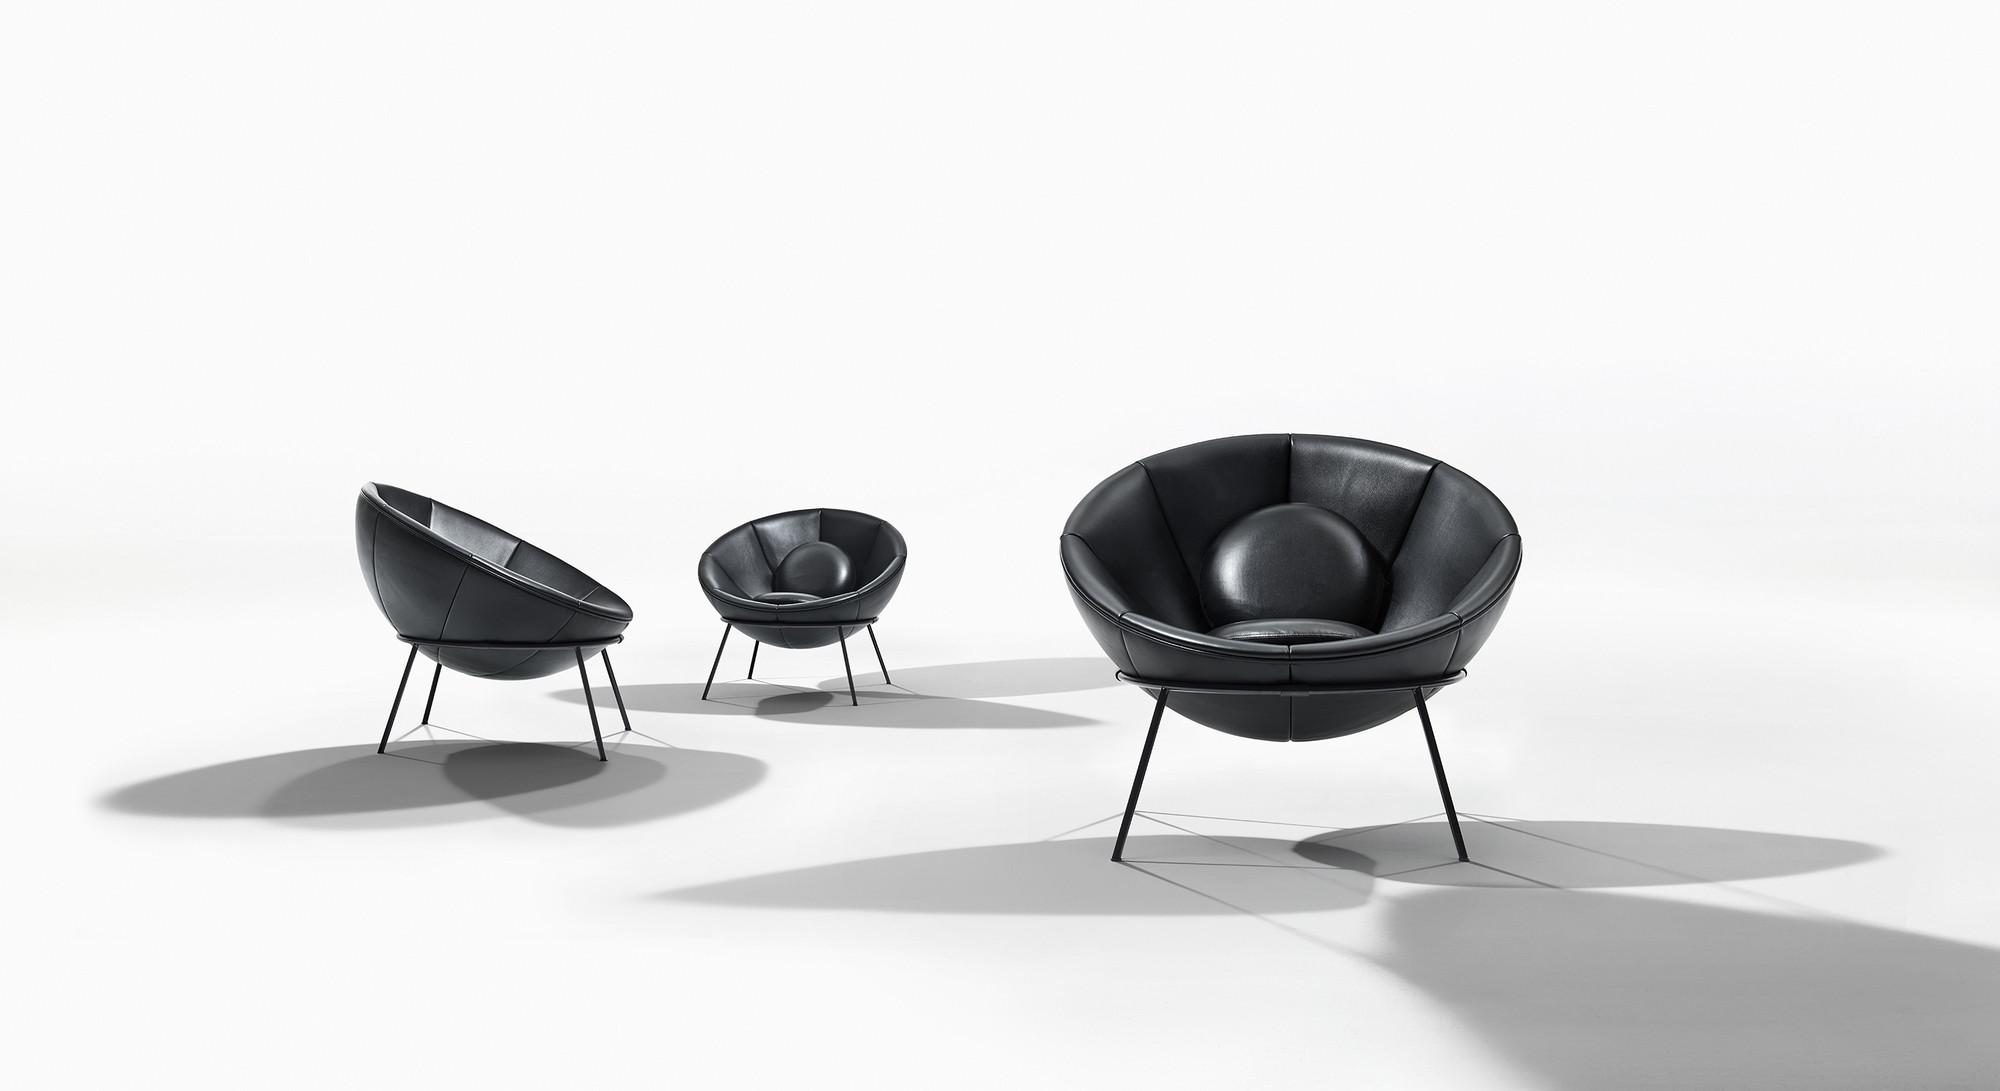 Arper Relaunches Lina Bo Bardi s Signature Bowl Chair